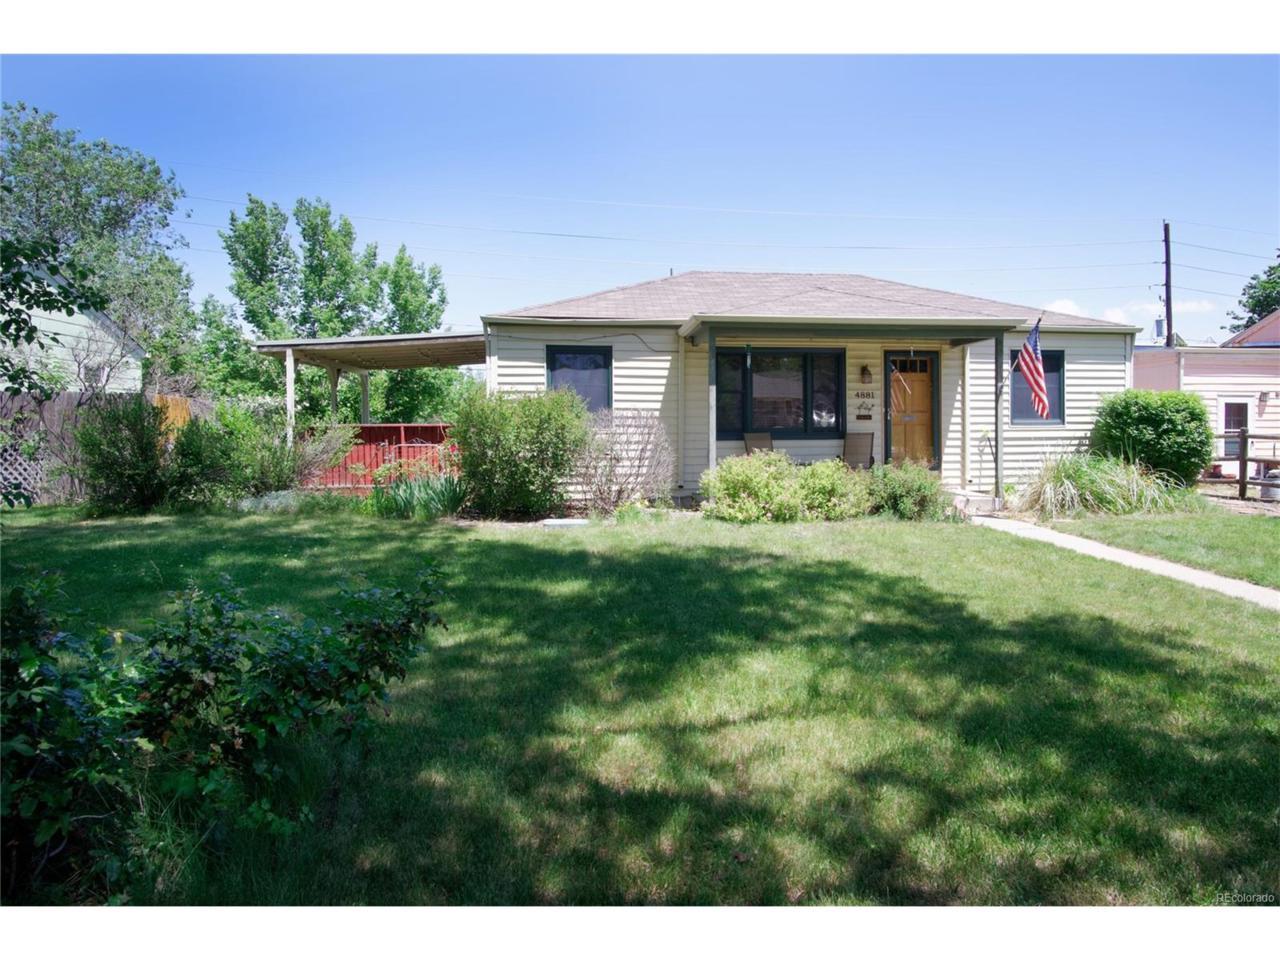 4881 E Missouri Avenue, Denver, CO 80246 (MLS #5970769) :: 8z Real Estate